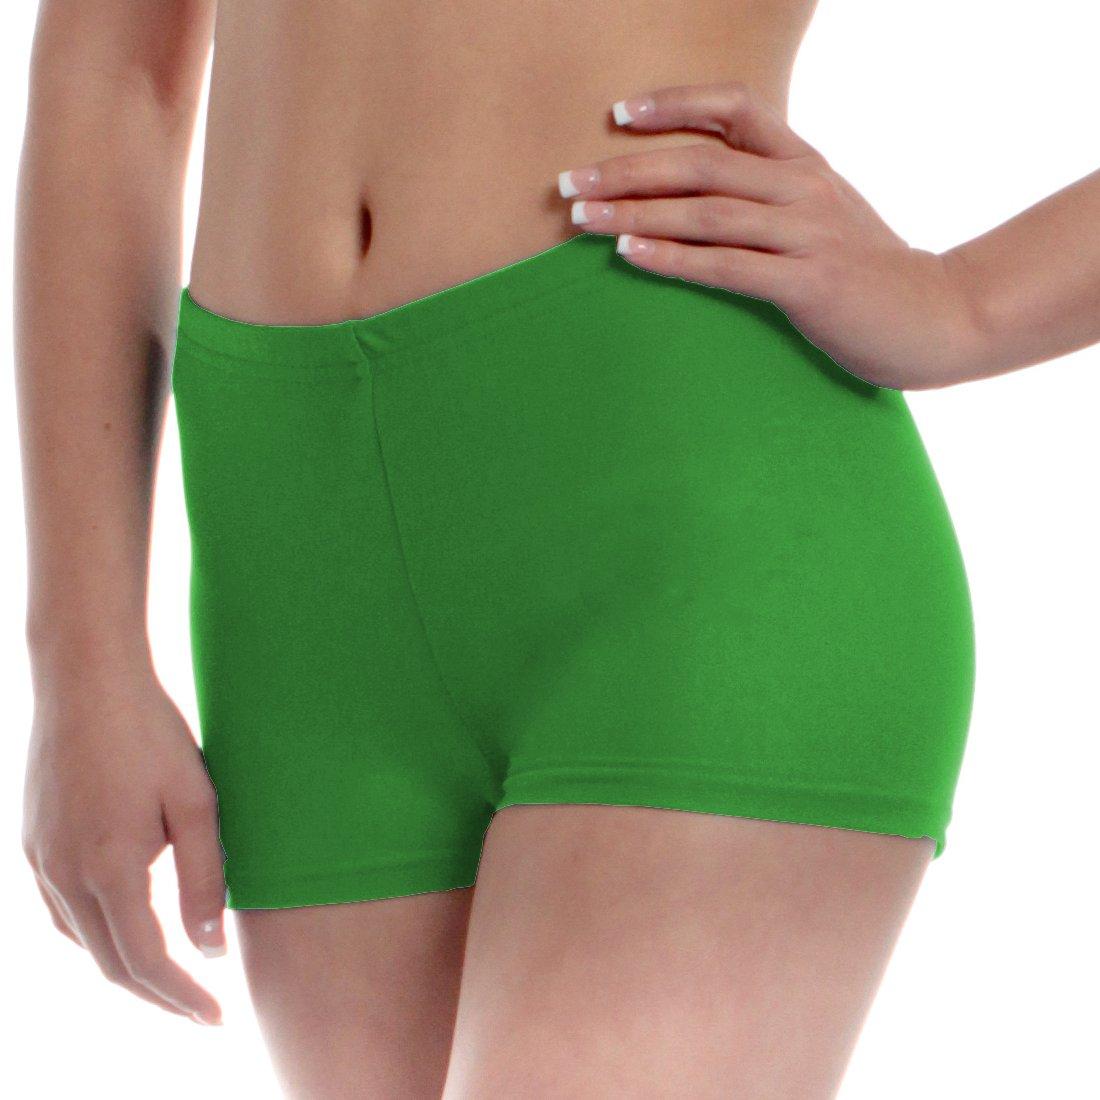 Mens Long Dance Shorts Large Green by B Dancewear Adult Sizes by Bailar Dancewear